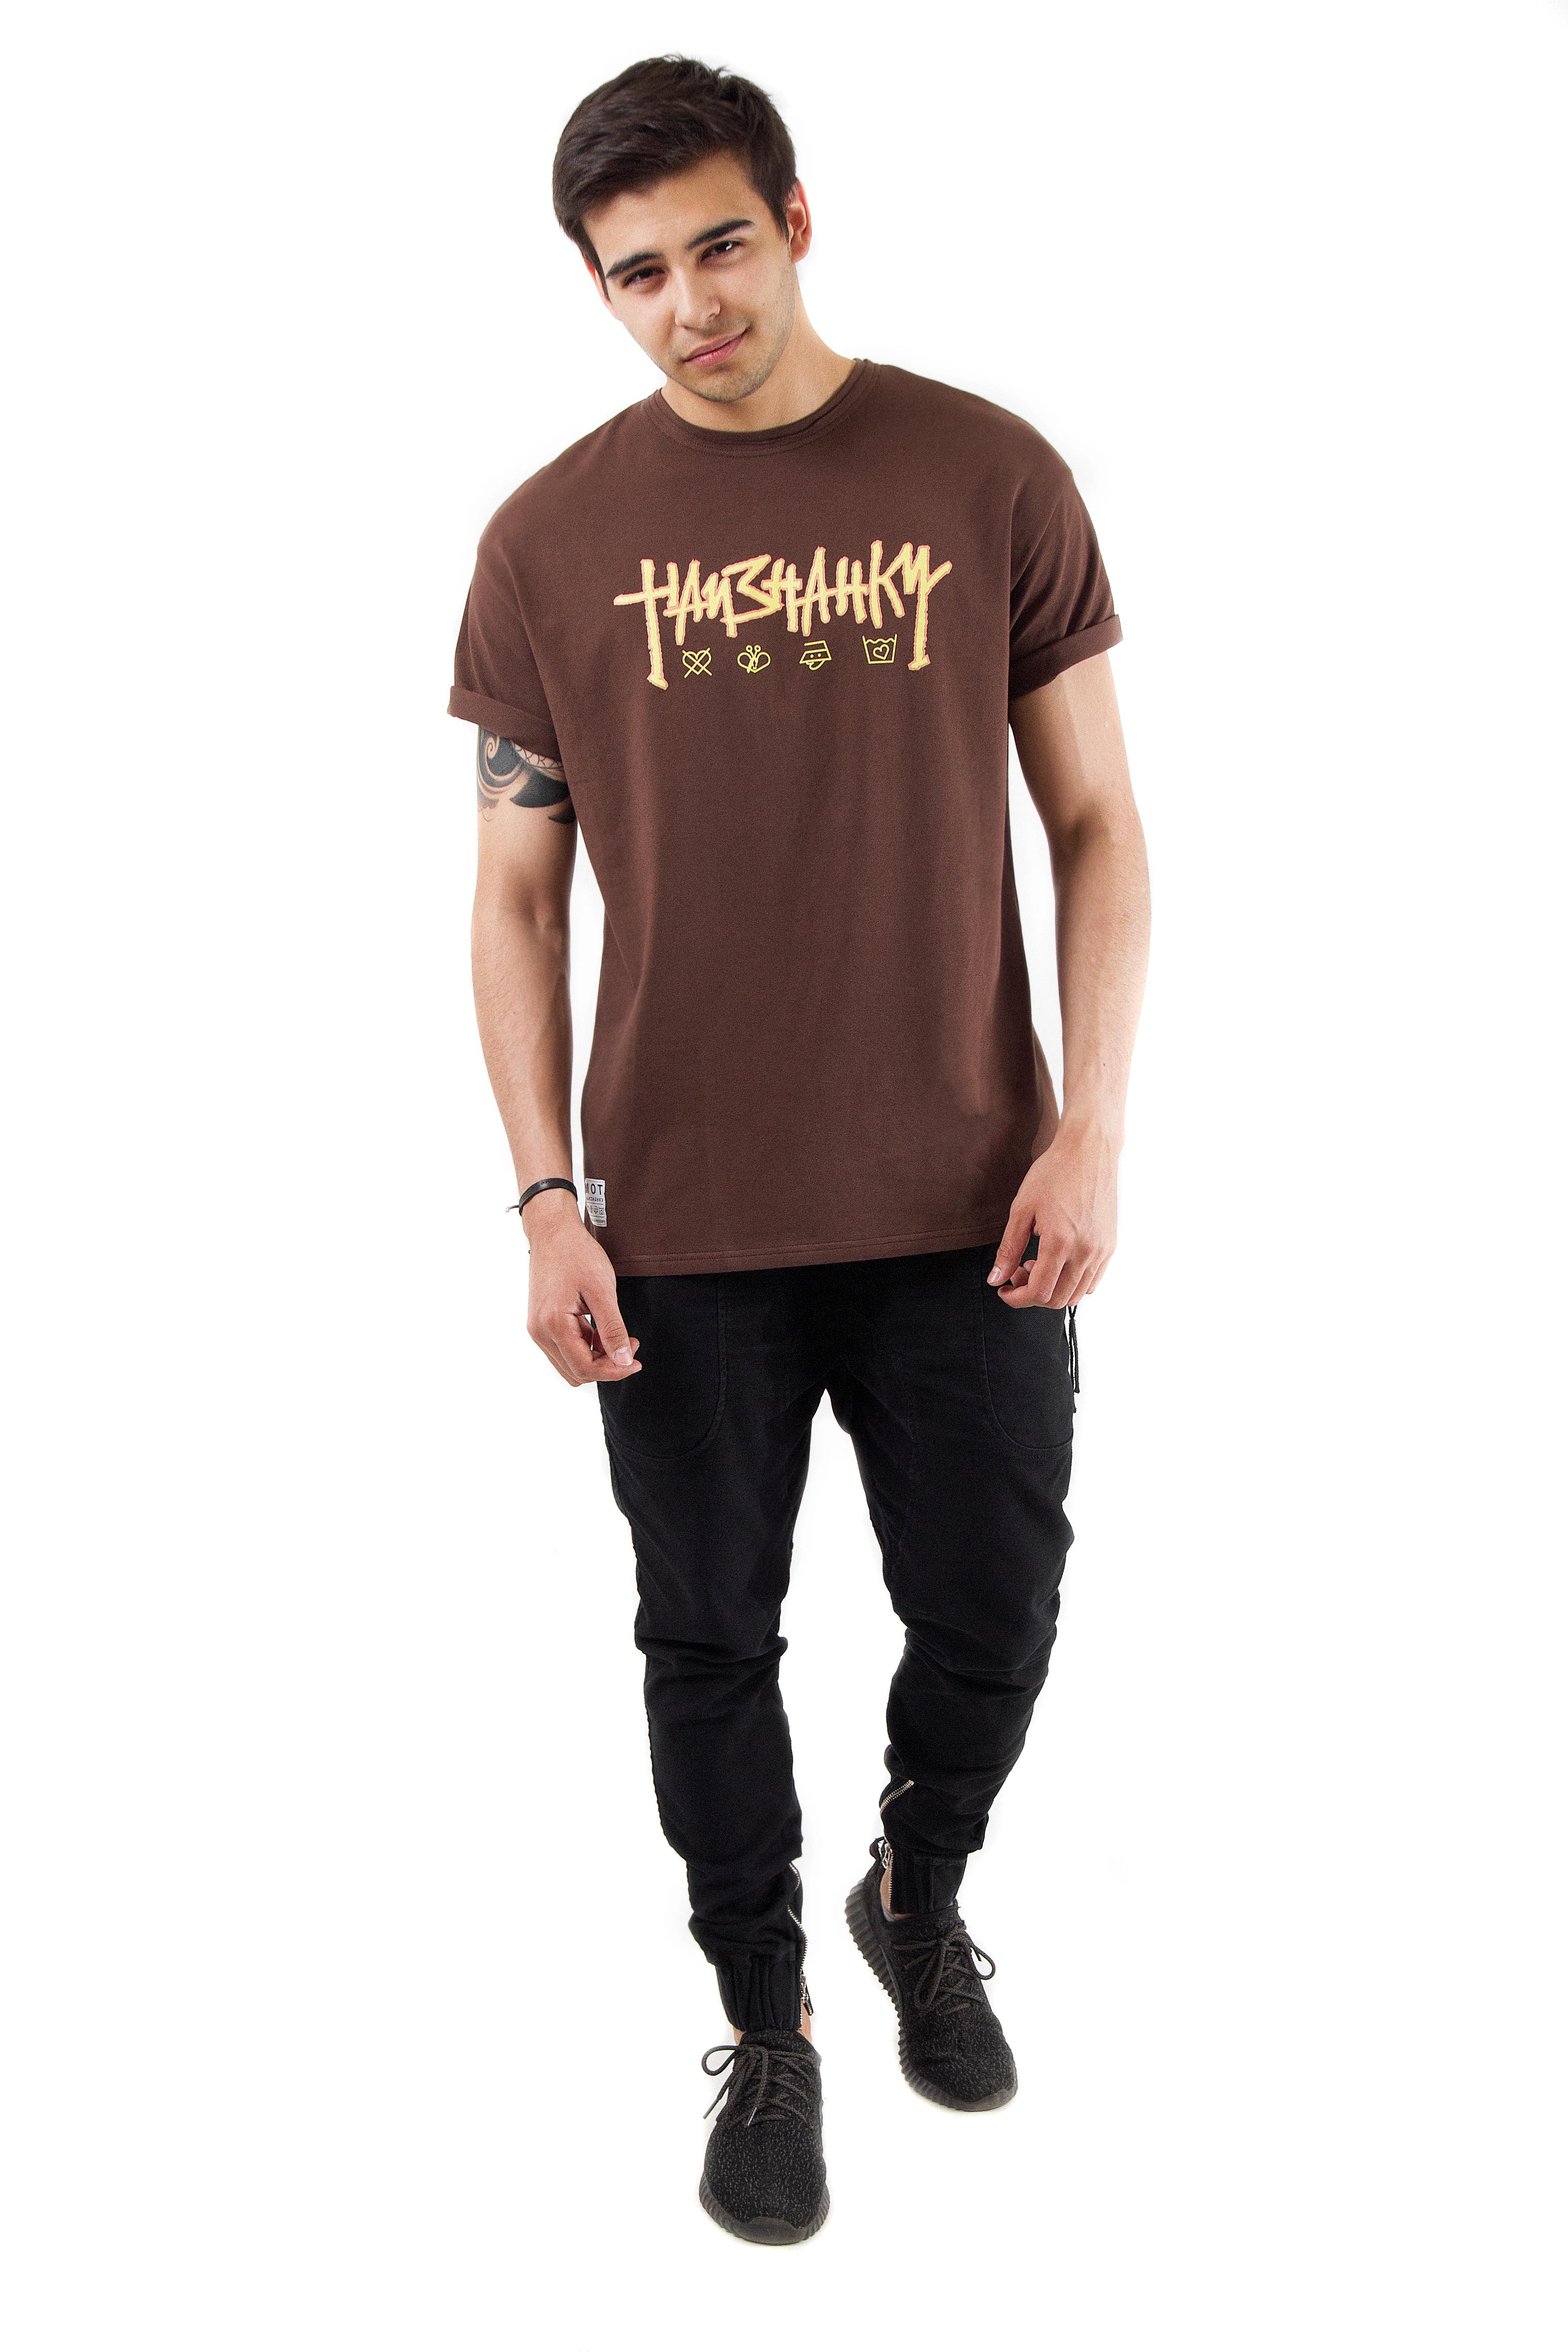 Mens T-shirt naiznanku от BlackStarWear INT